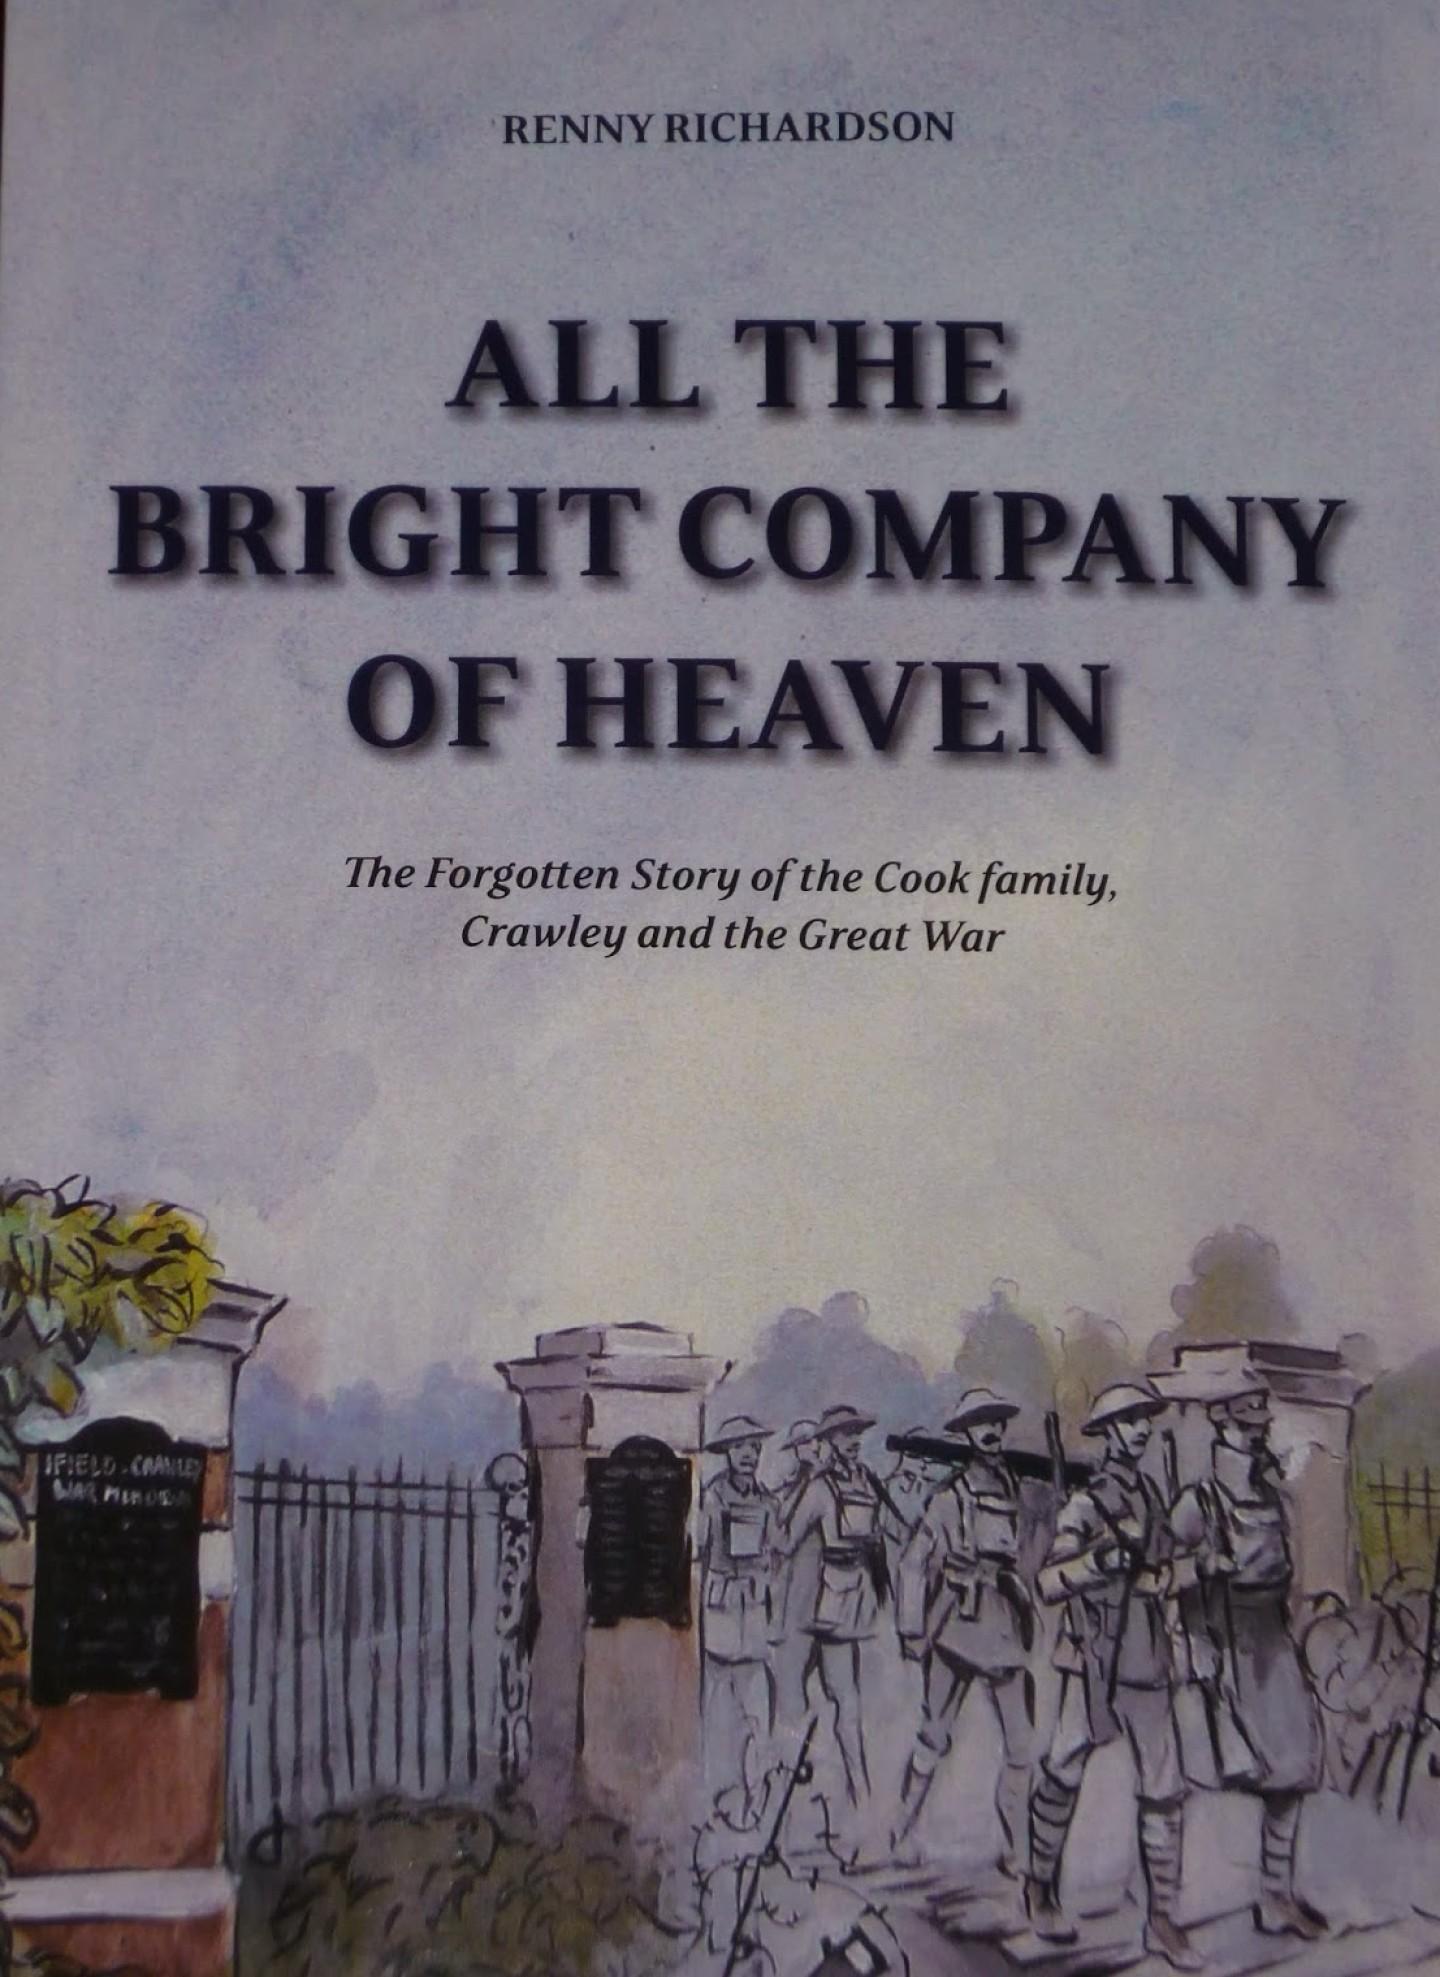 All the Bright Company of Heaven cover